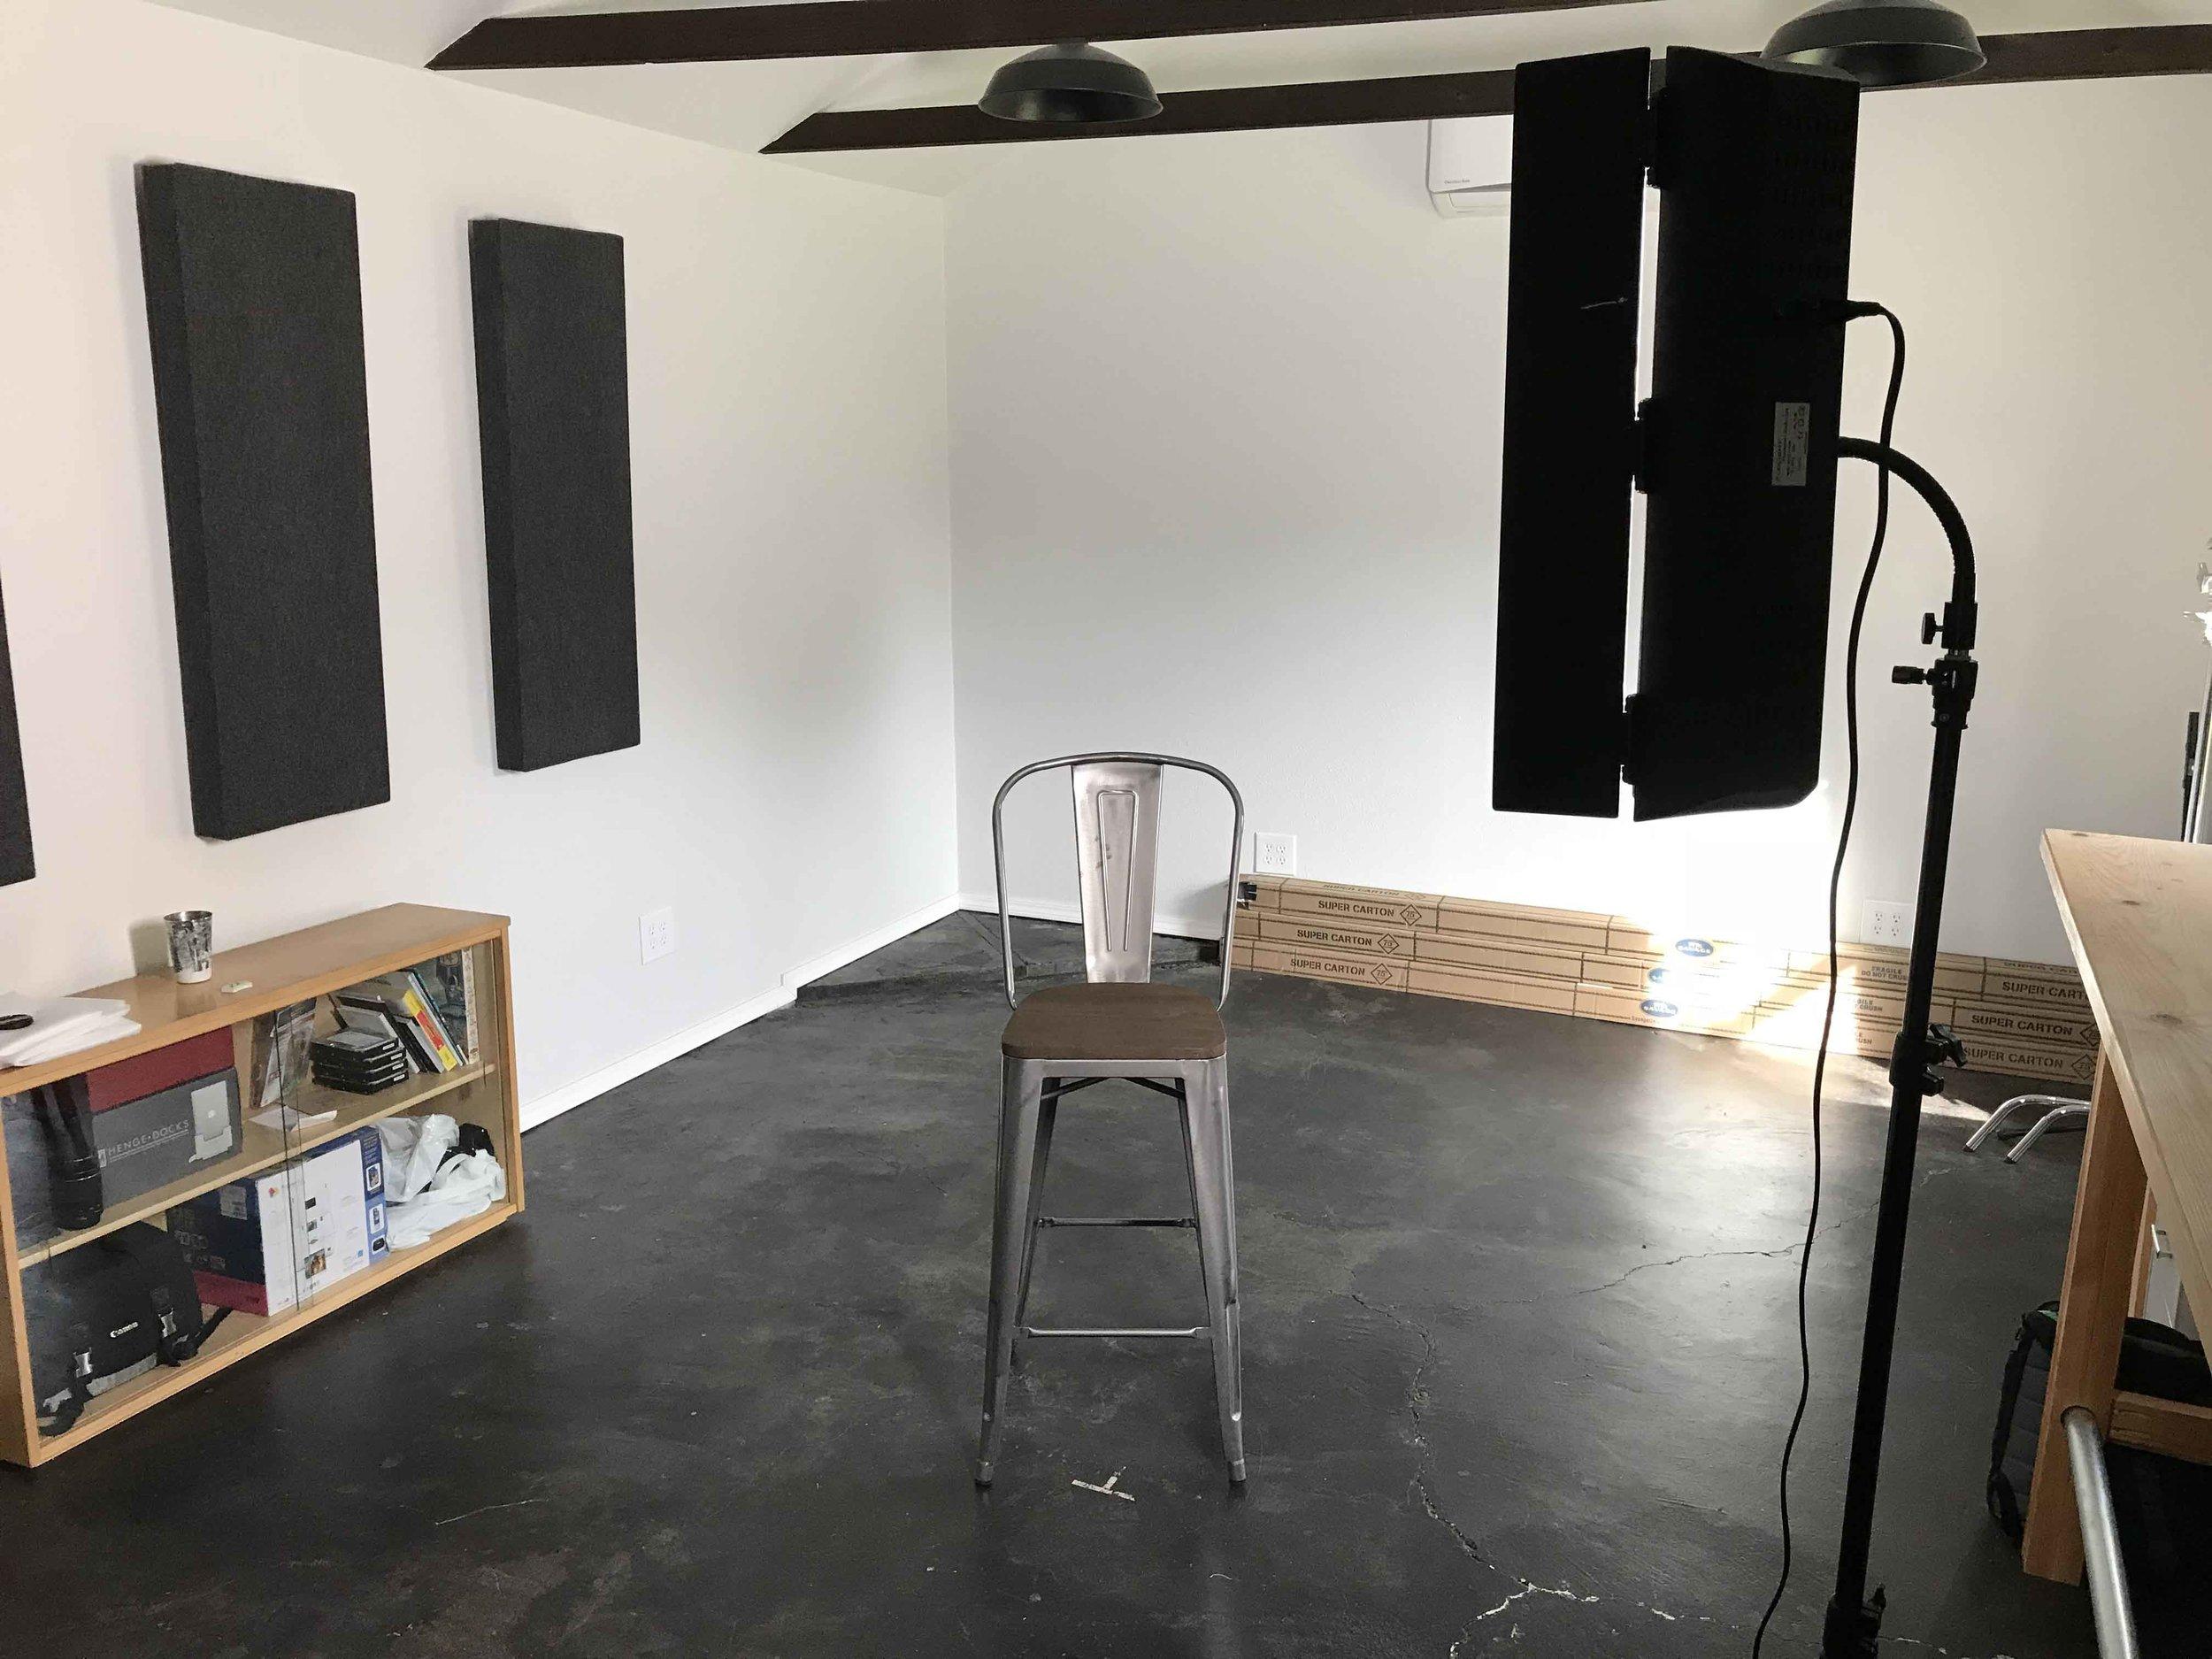 interview-lighting-guide-3-00003.jpg